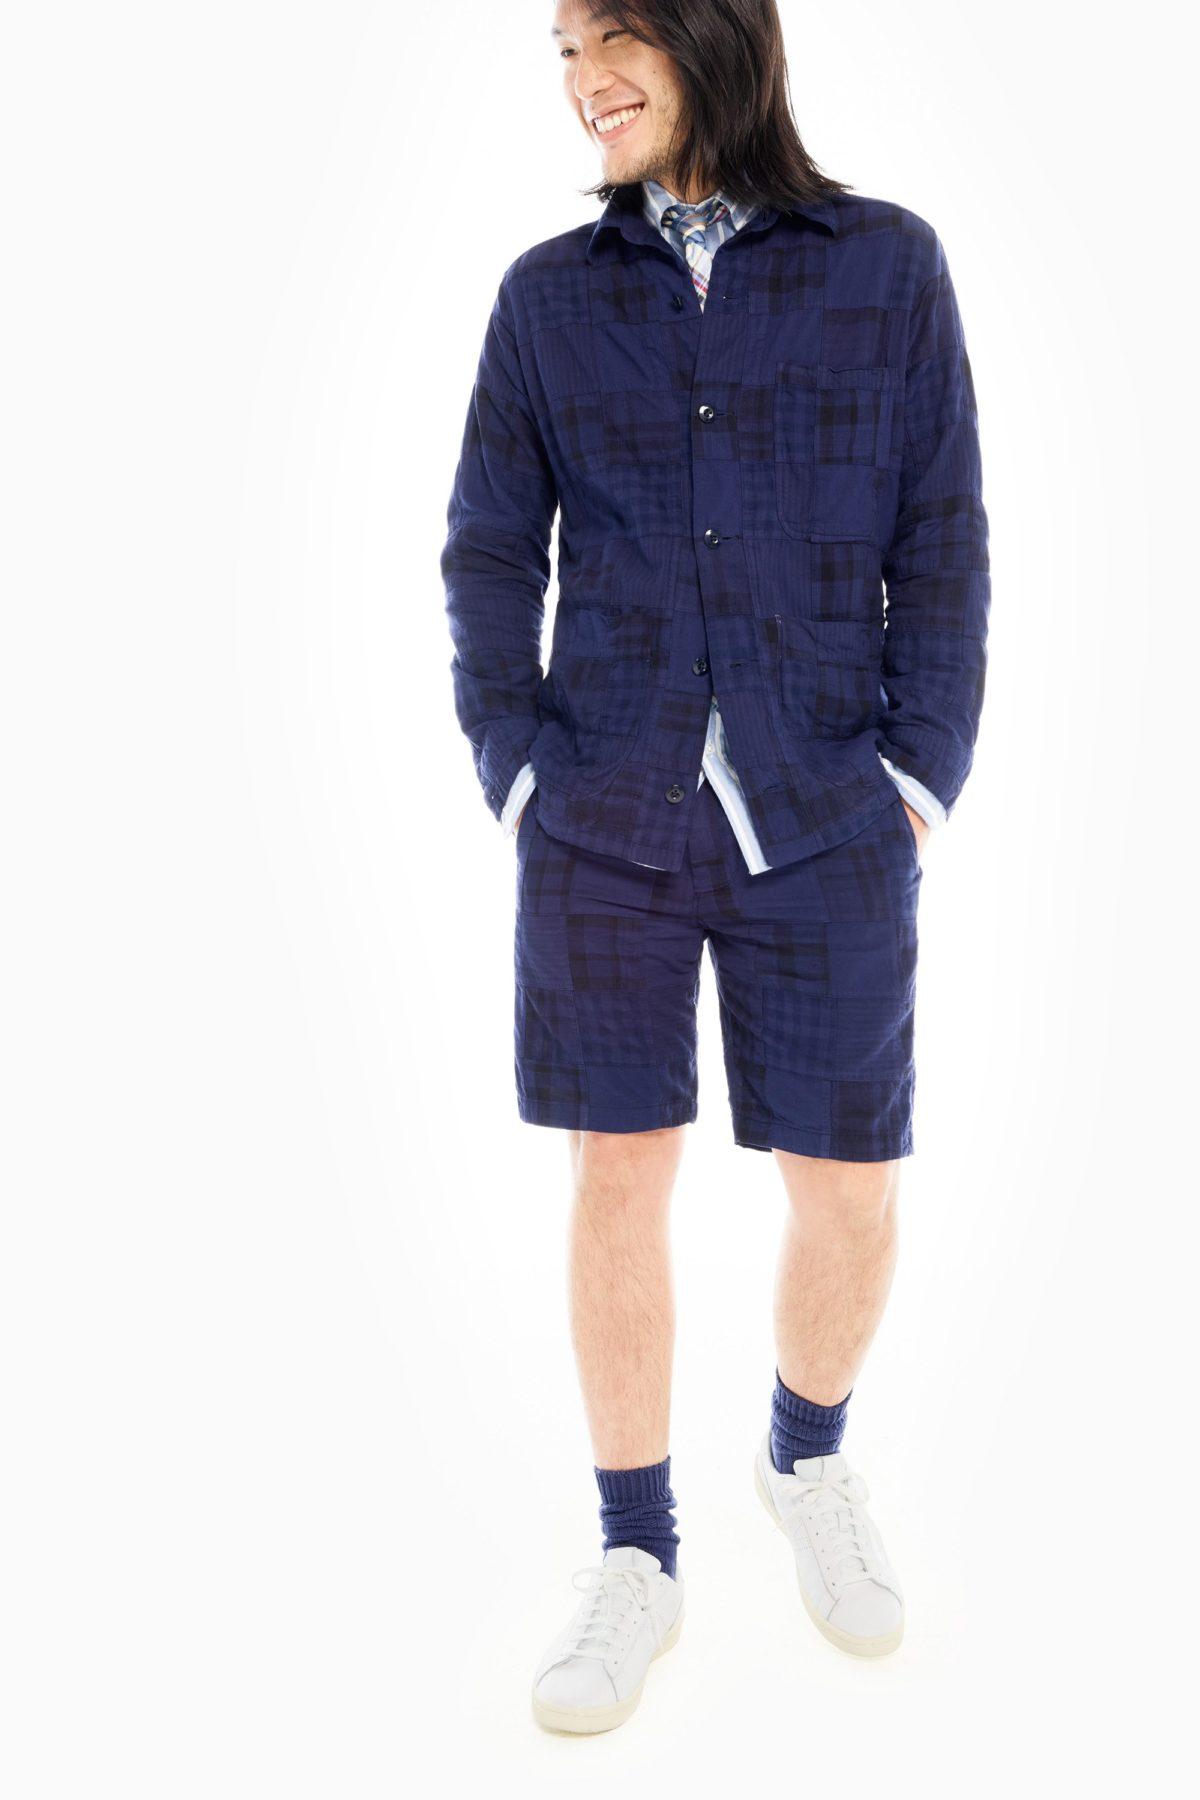 trendsfolio-american-apparel-4-01